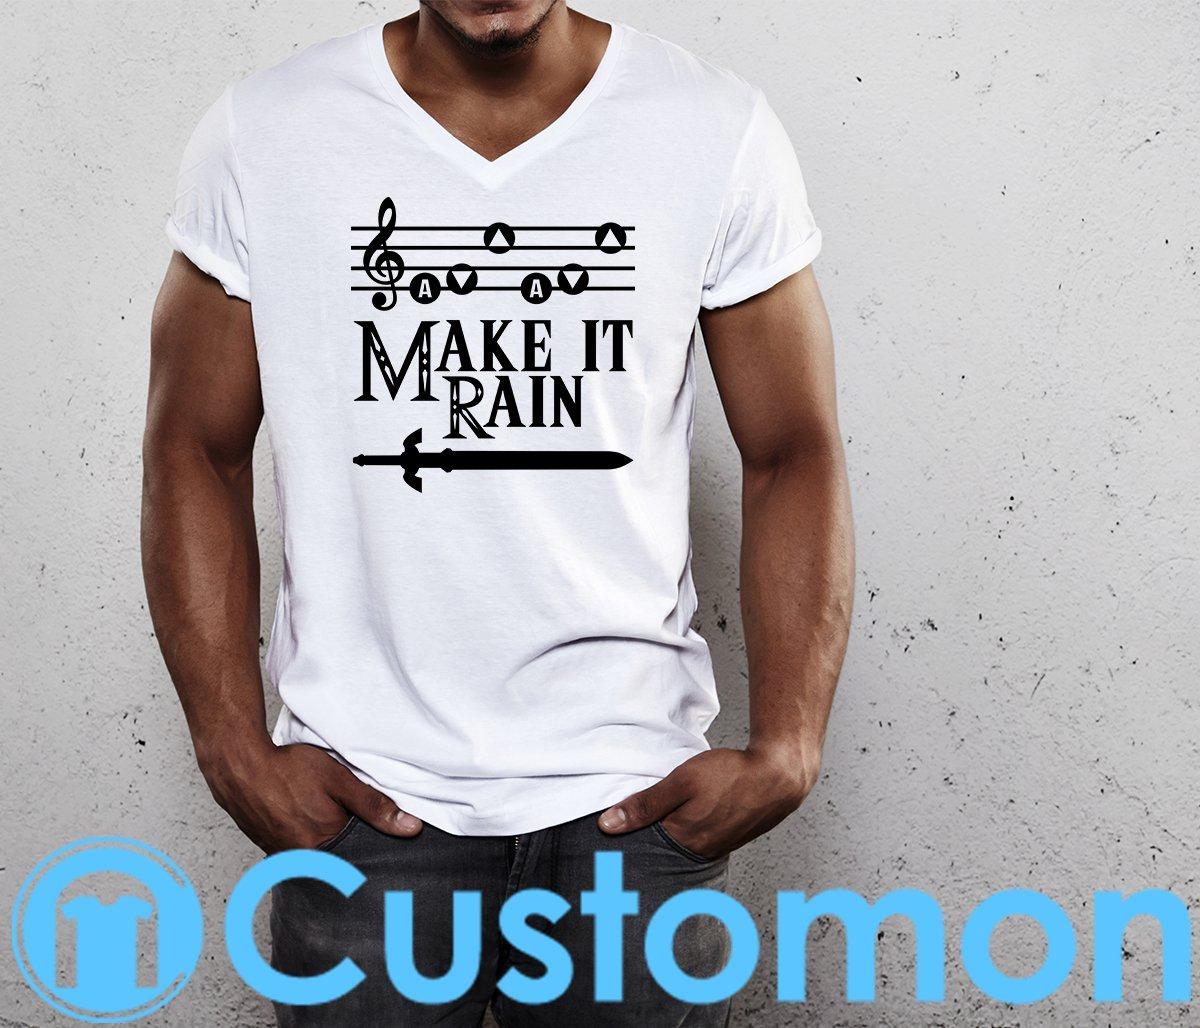 843e6f6f77b13 Make it Rain Legend of Zelda Men s T-shirt DESIGNER by  Cerryl https